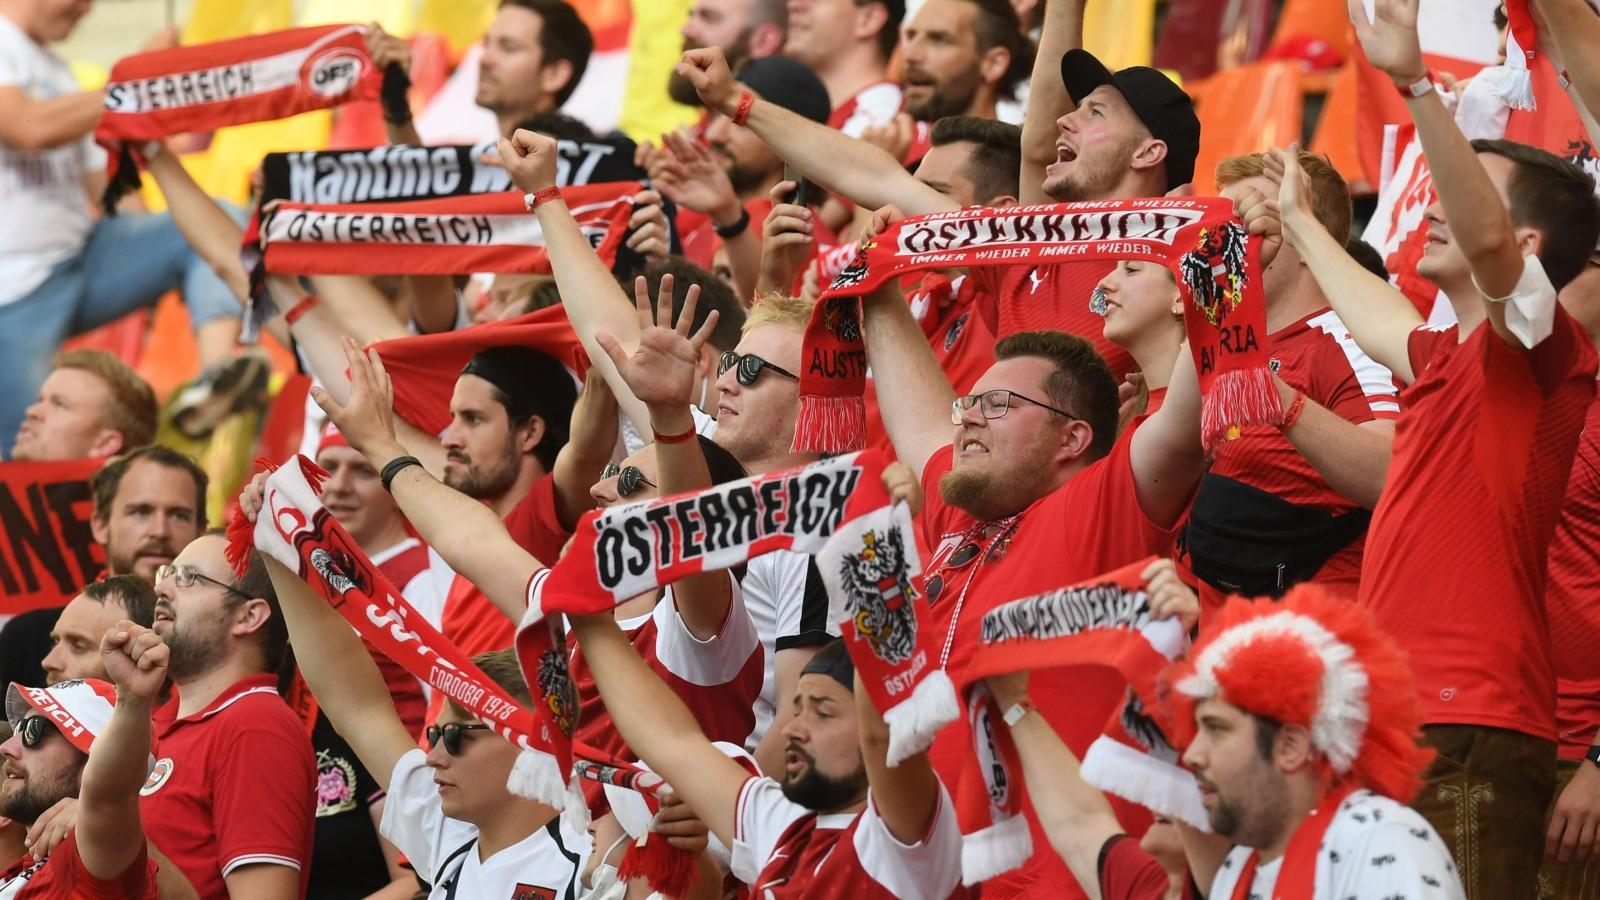 Trực tiếp Ukraine 0-1 Áo: Alaba đóng vai kiến tạo